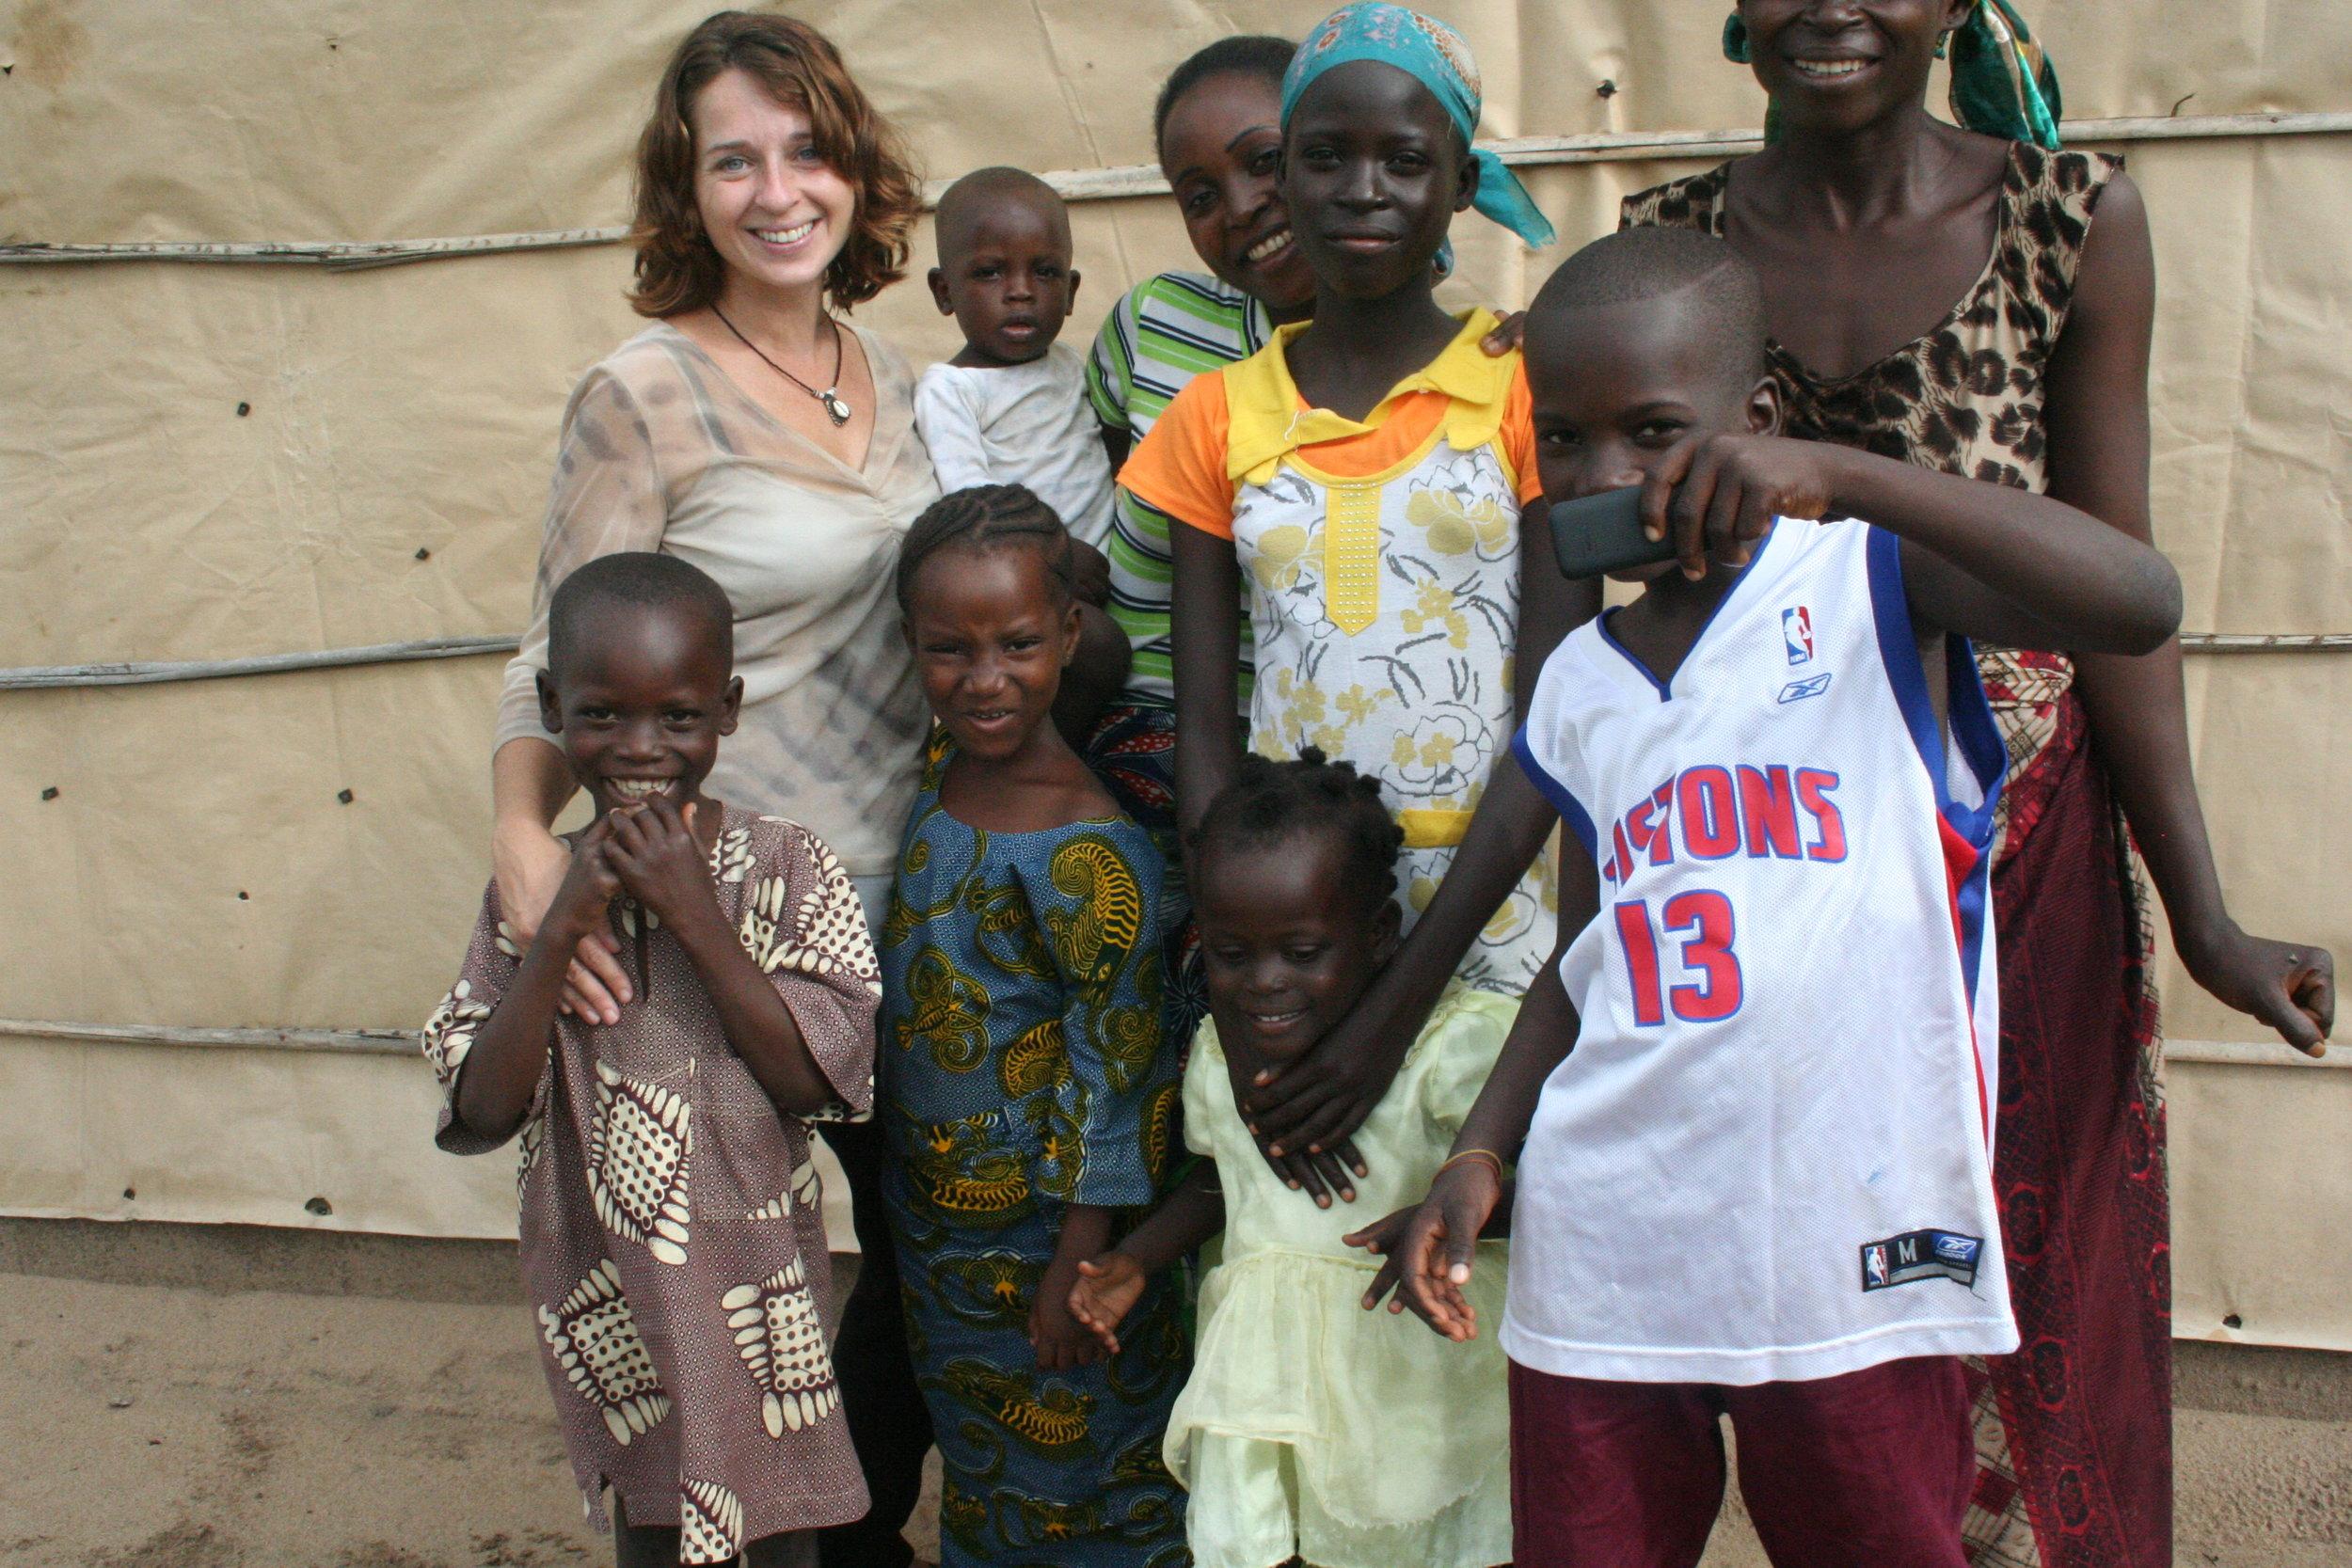 Photo taken in PK11, a neighborhood in Cotonou. Photographer: Stuart O'Neil